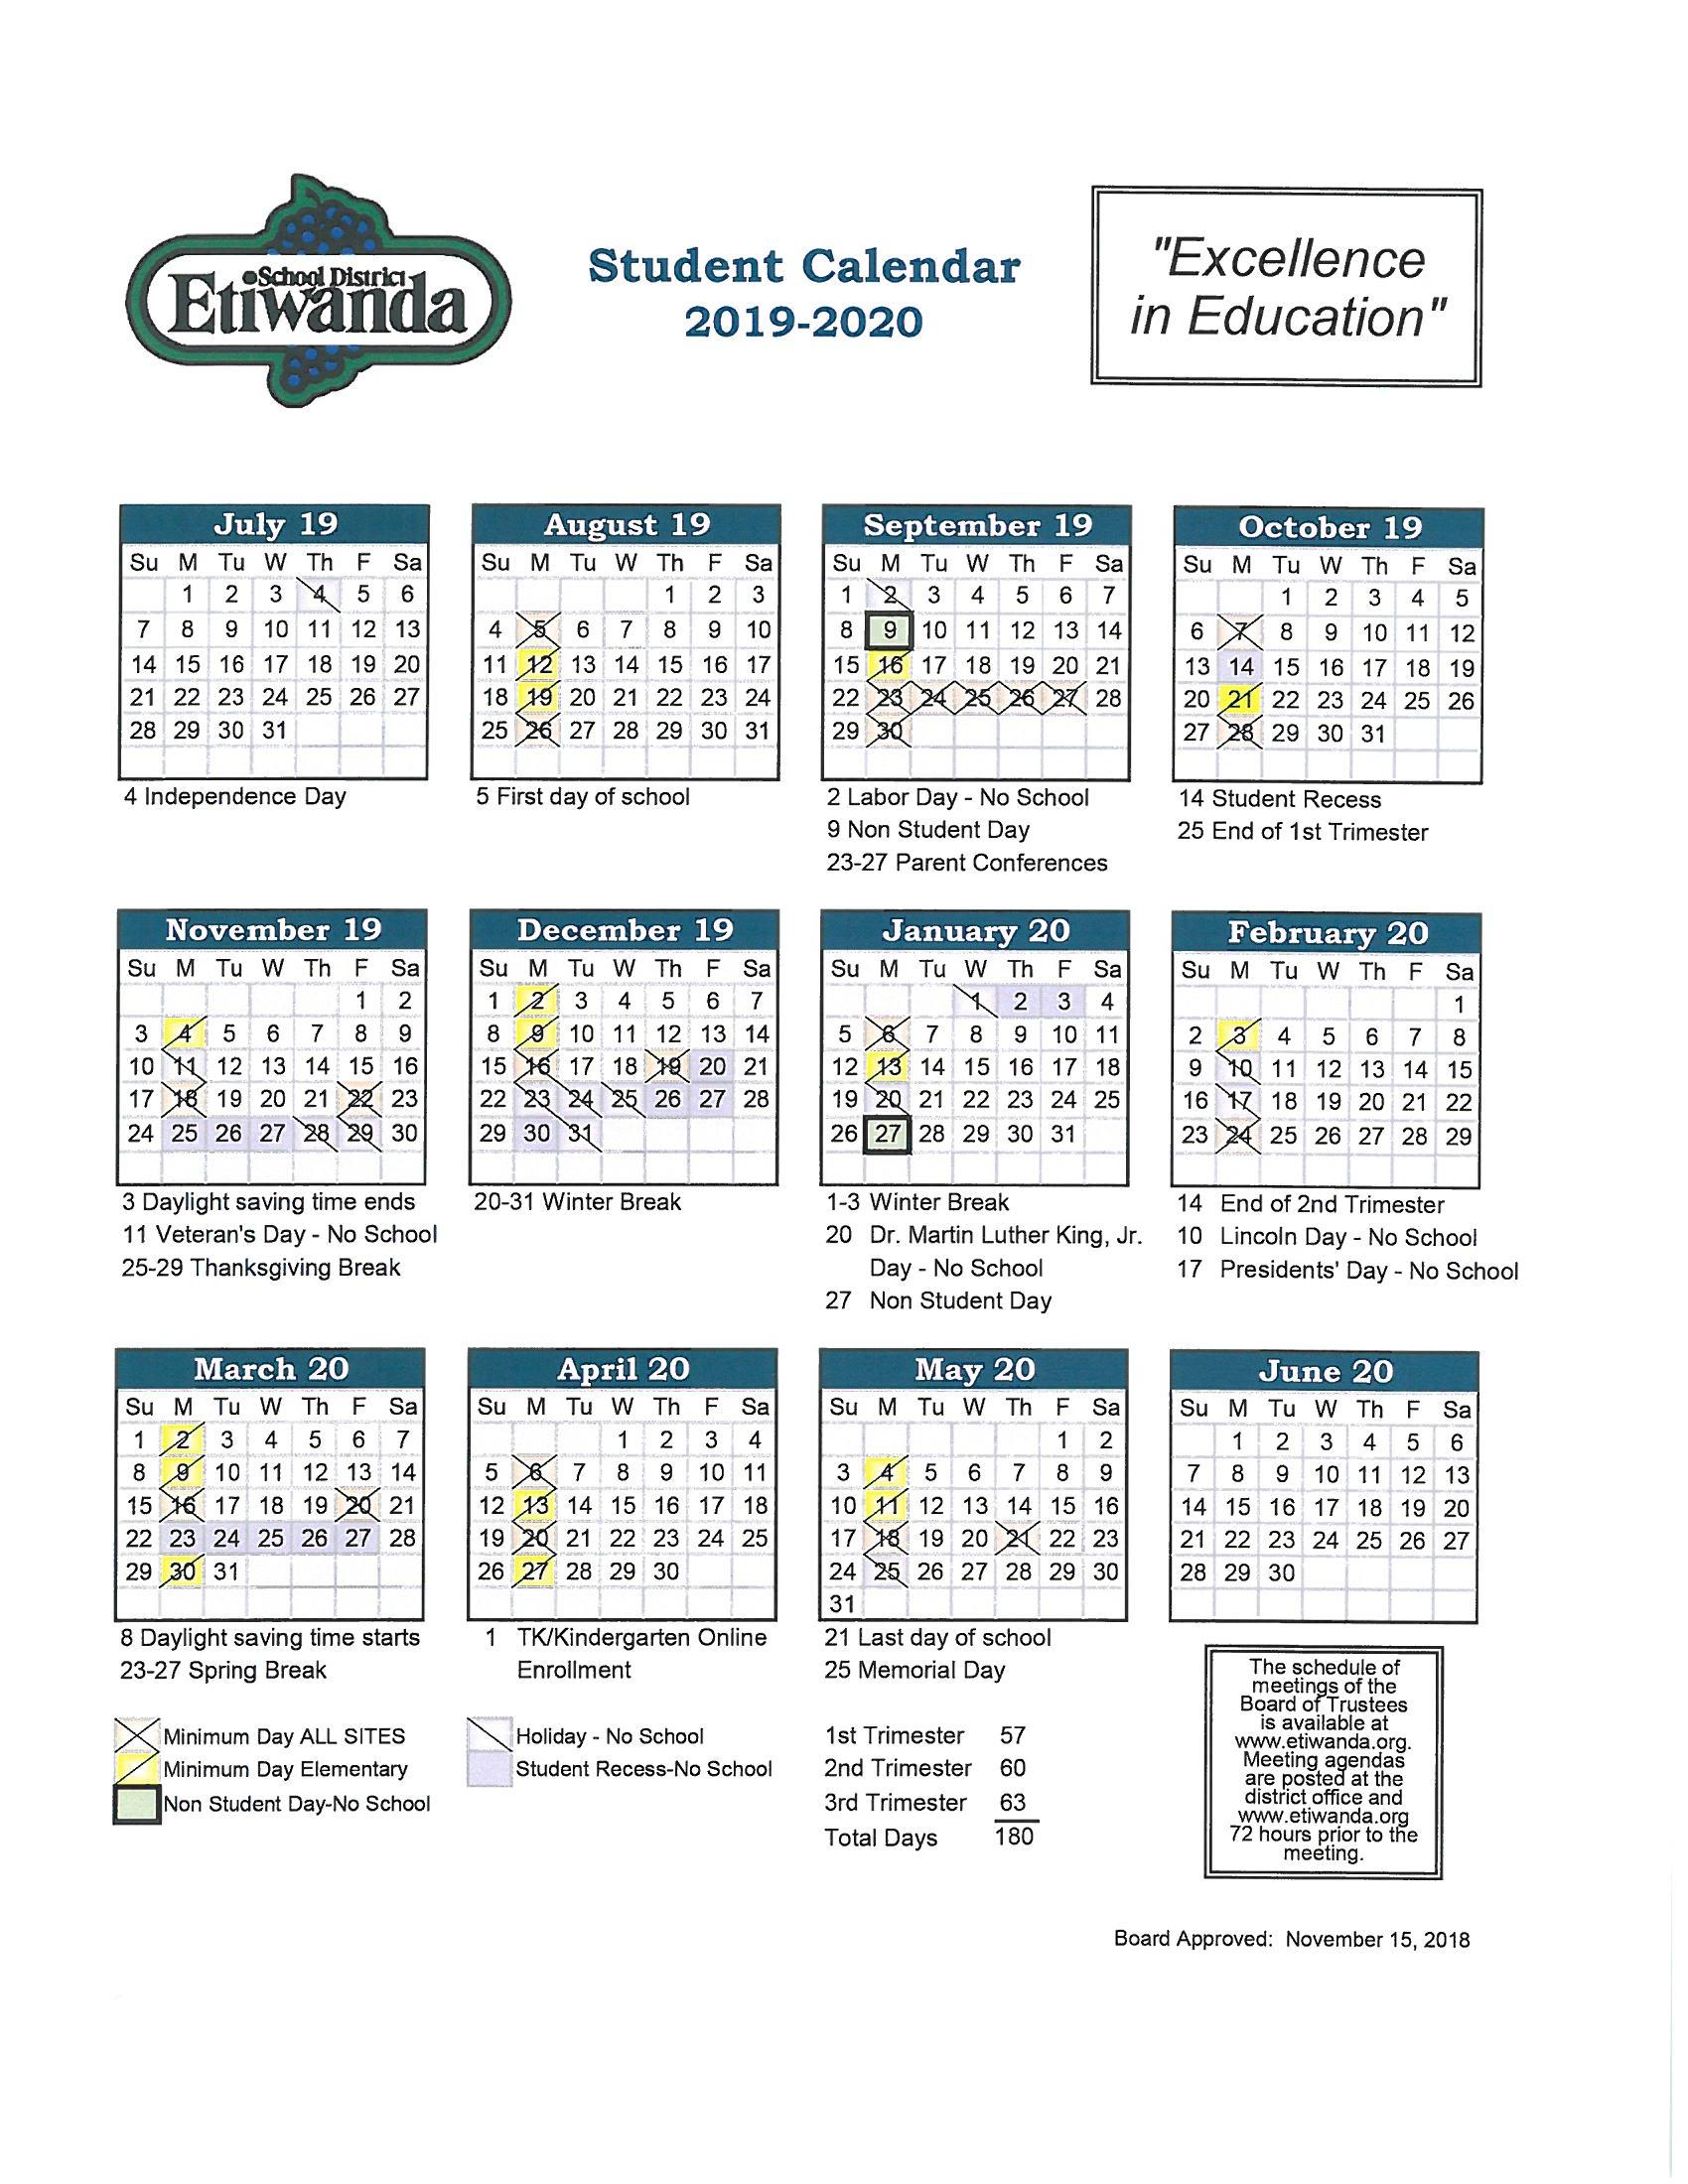 2019 2020 Student Calendar – Caryn Elementary Within University Of Southern California School Calendar 2021 2020